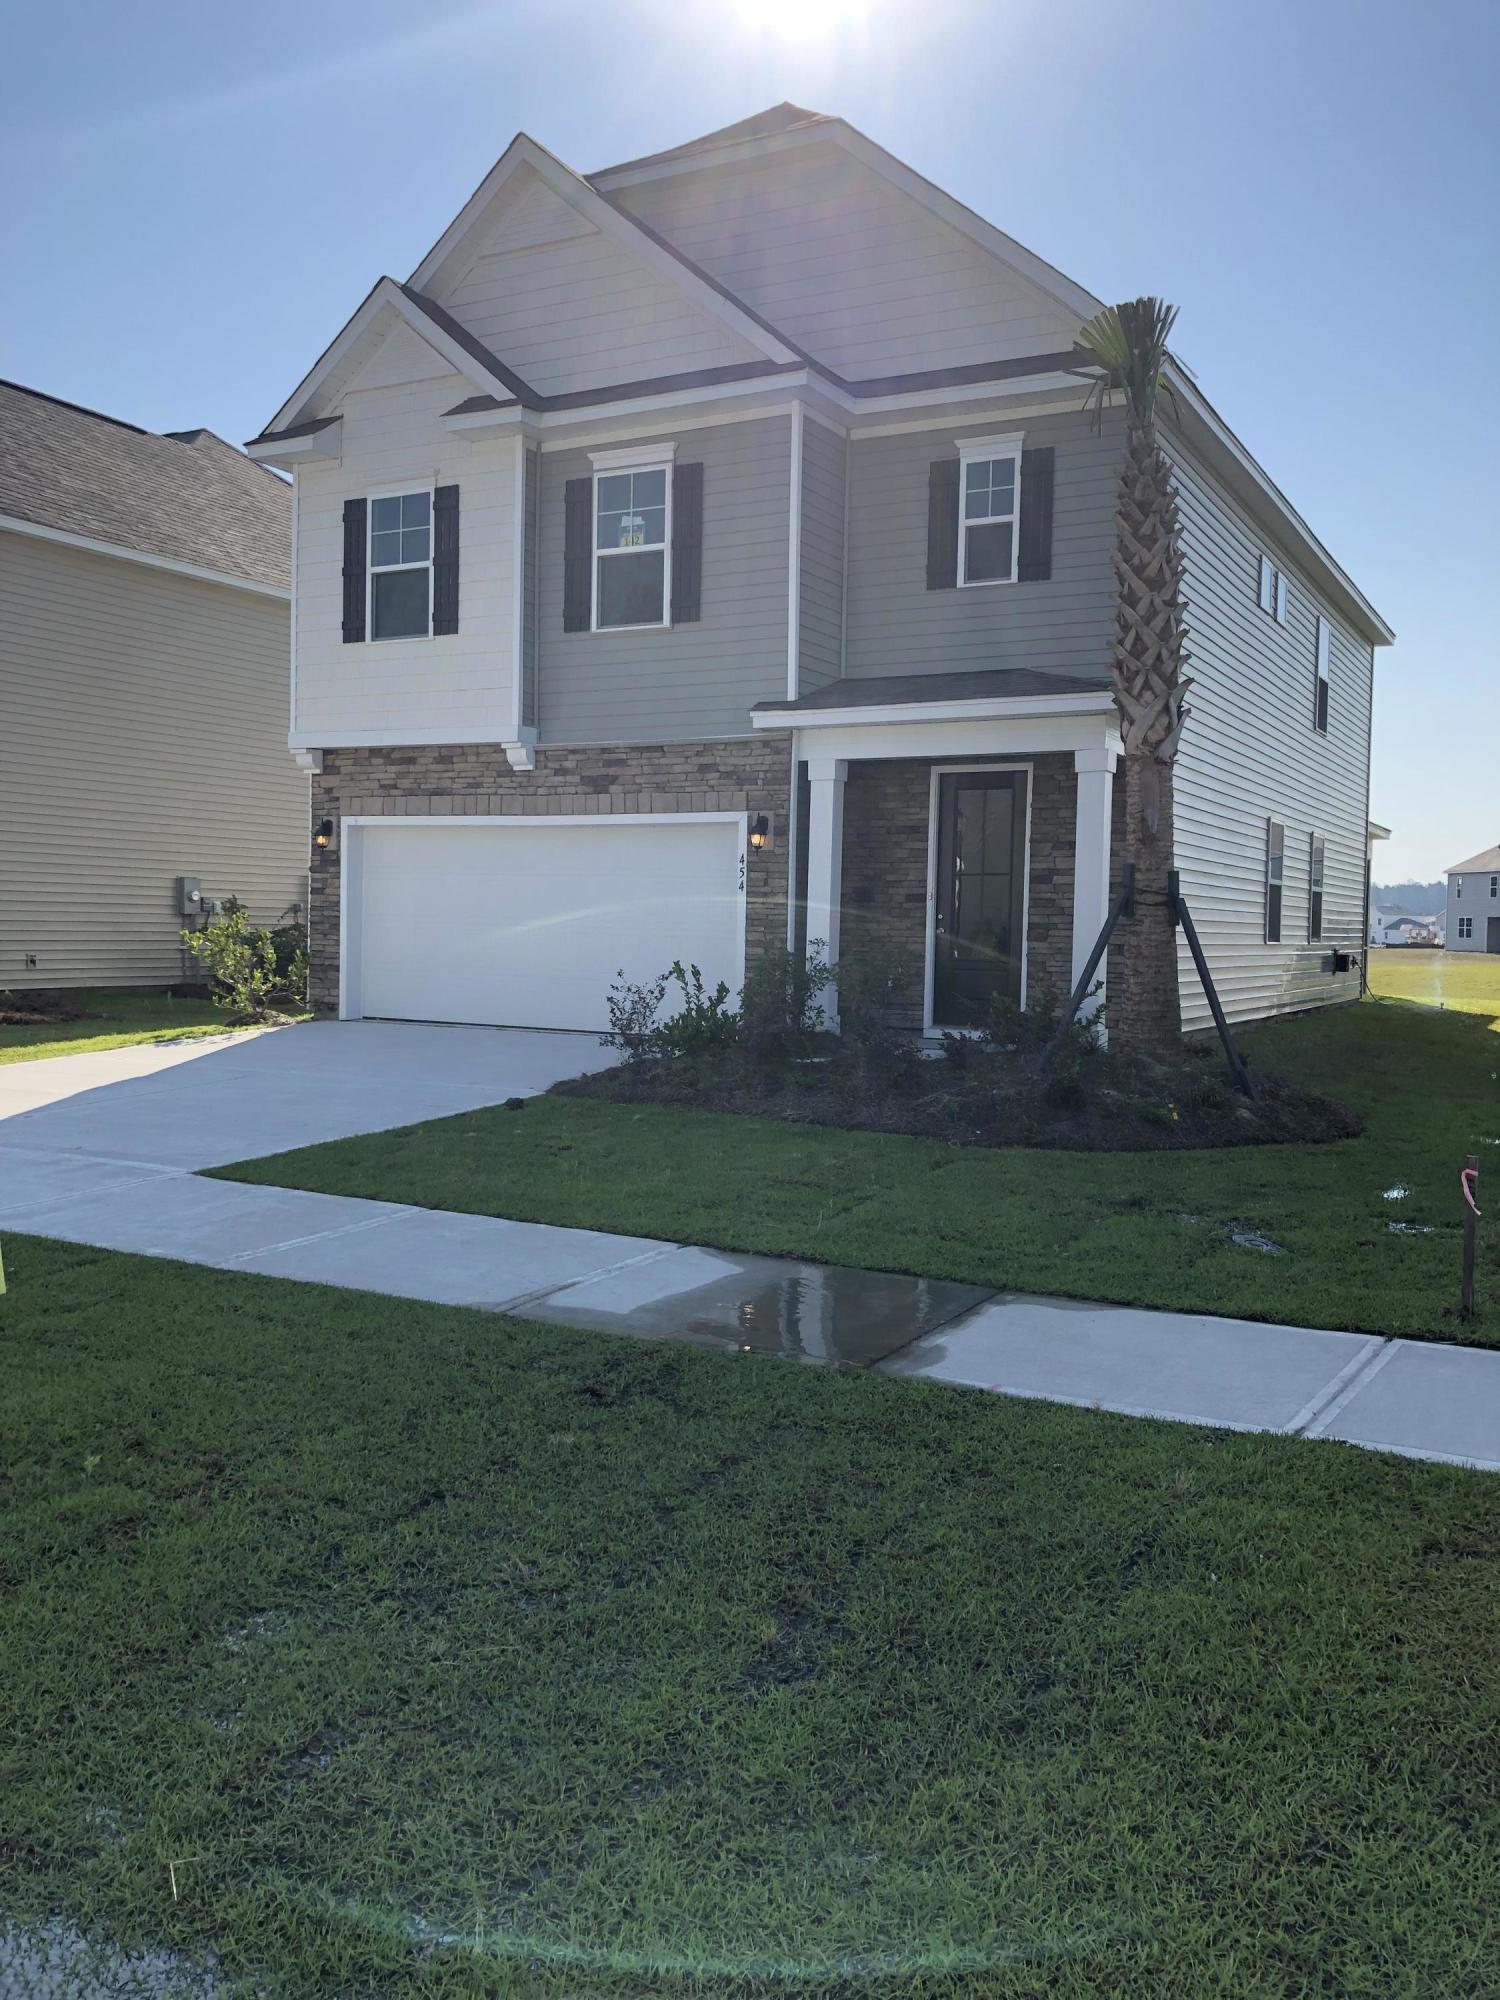 Cane Bay Plantation Homes For Sale - 454 Zenith, Summerville, SC - 13